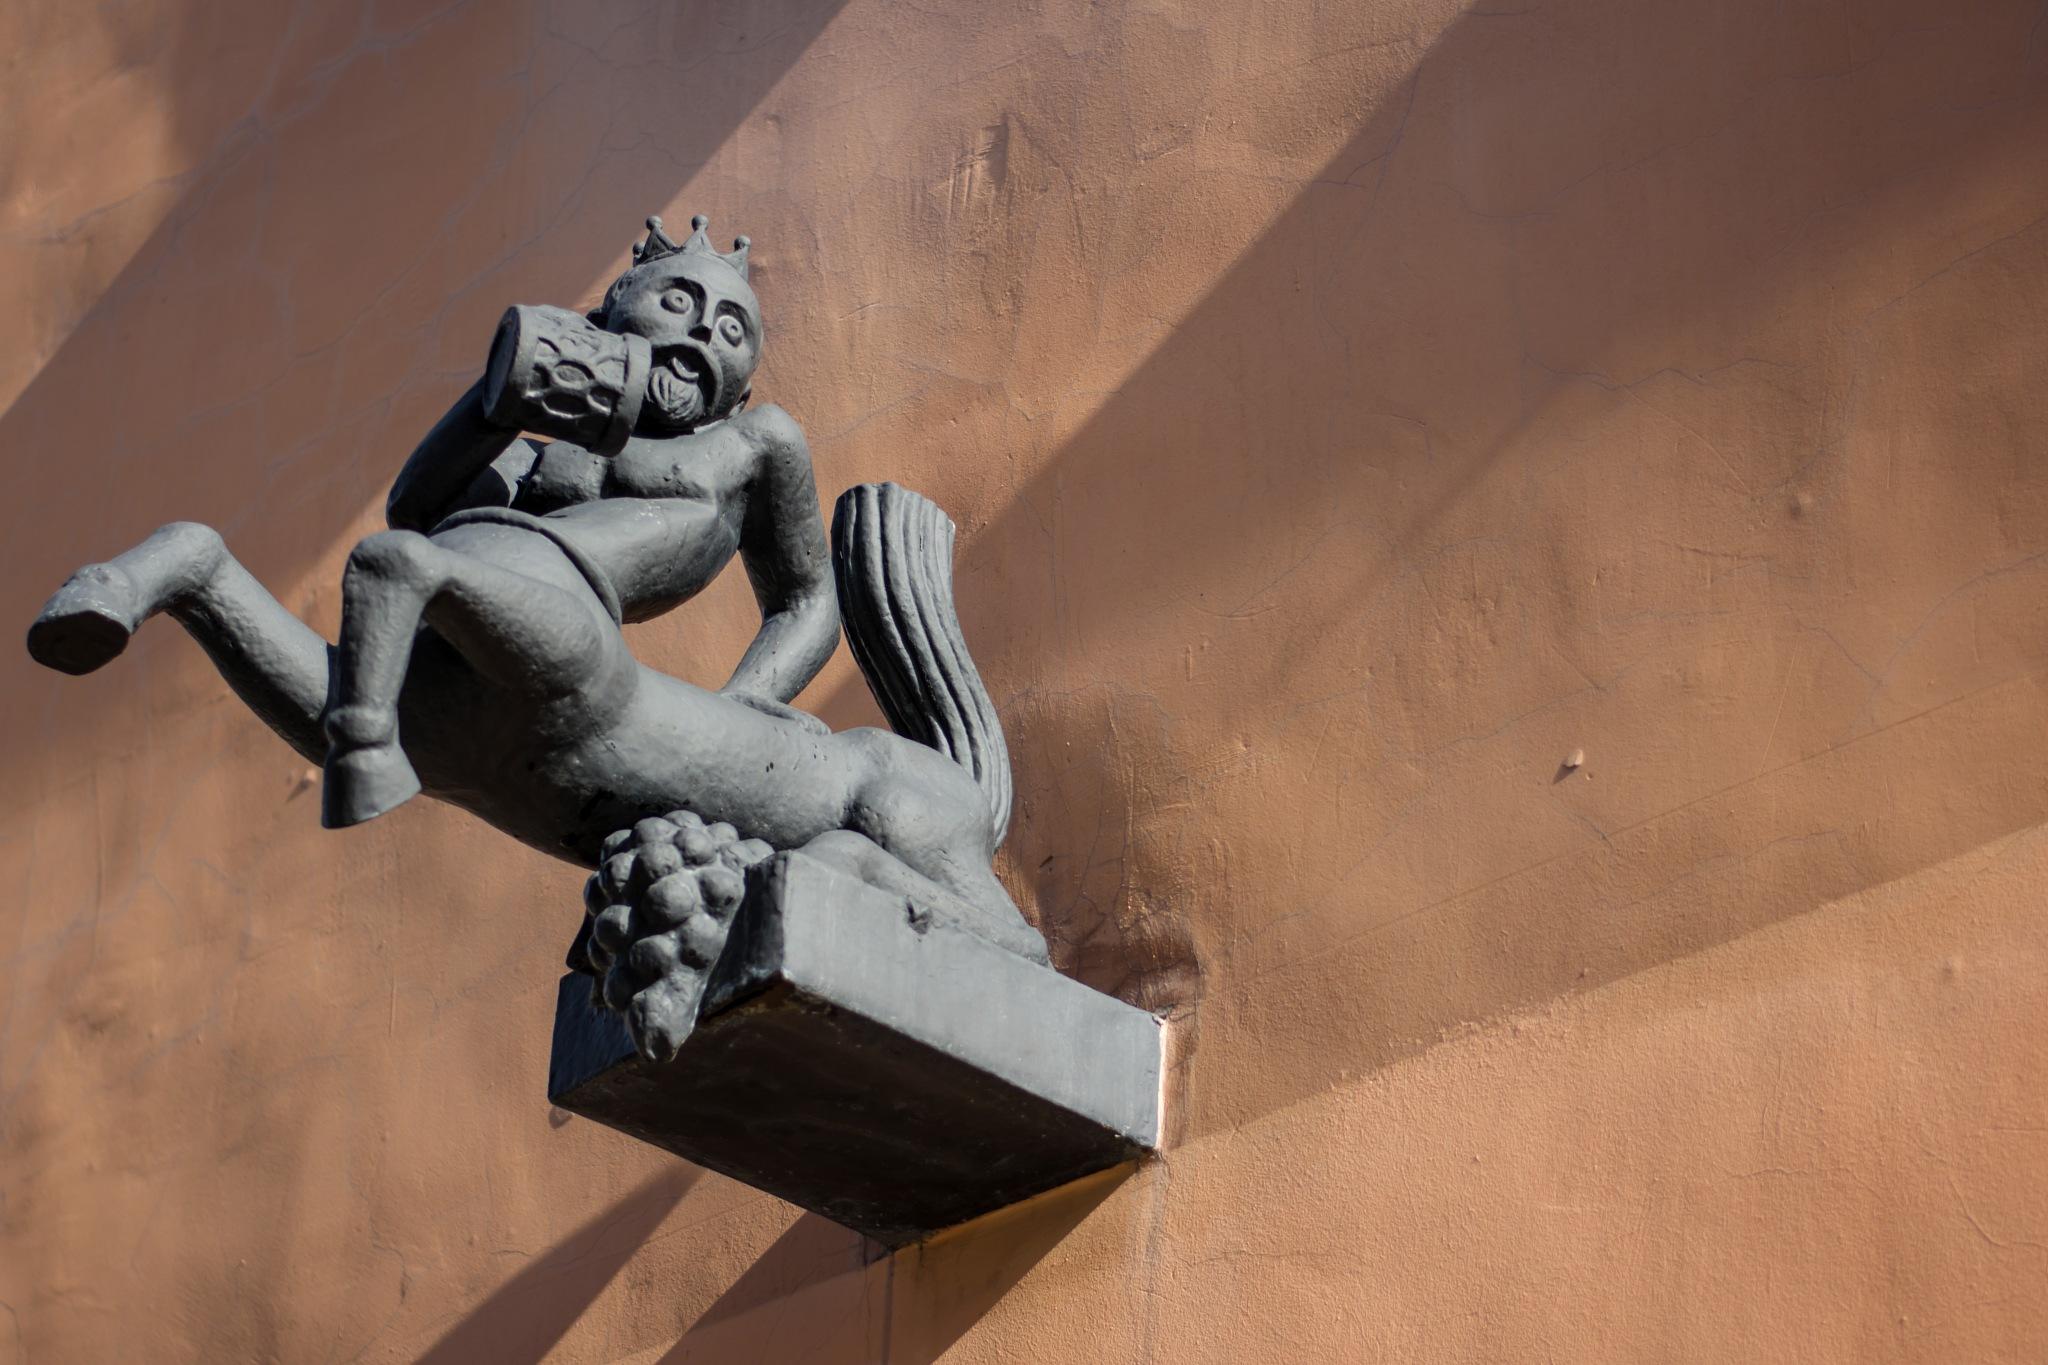 Monument to the Centaur (Lviv, Ukraine) by Roman Borshovskyy